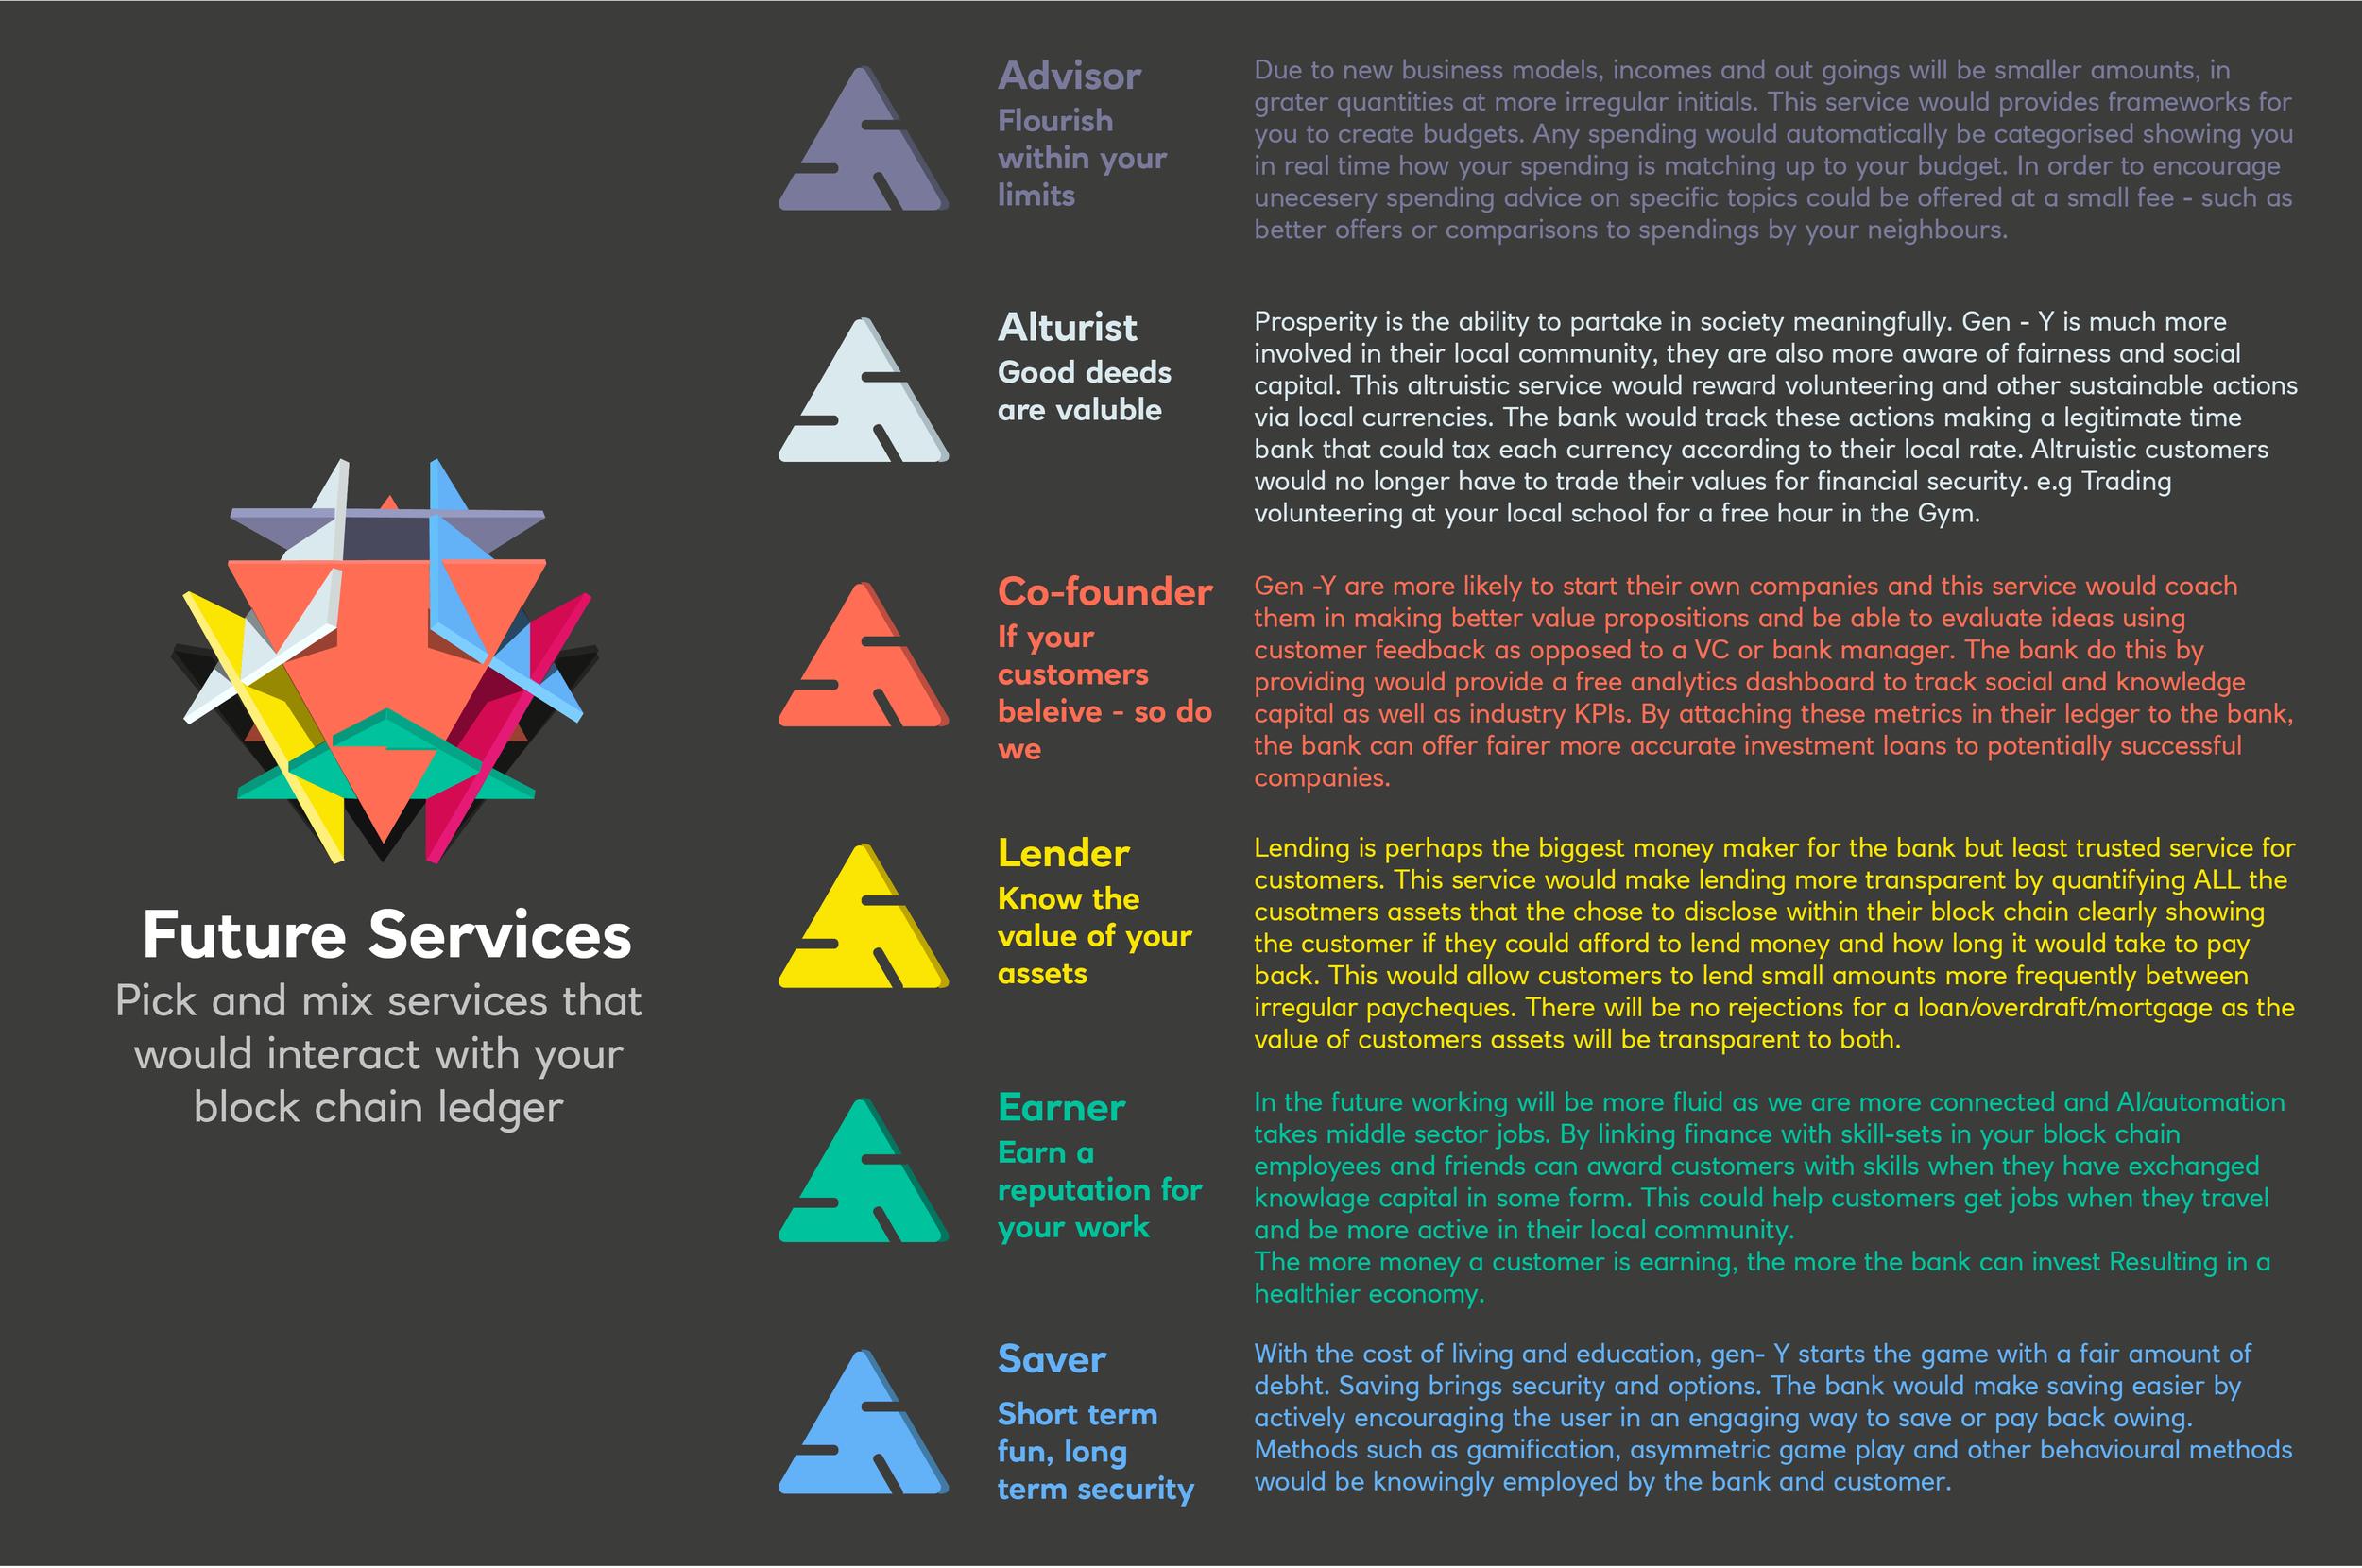 RBS Future Service Concepts